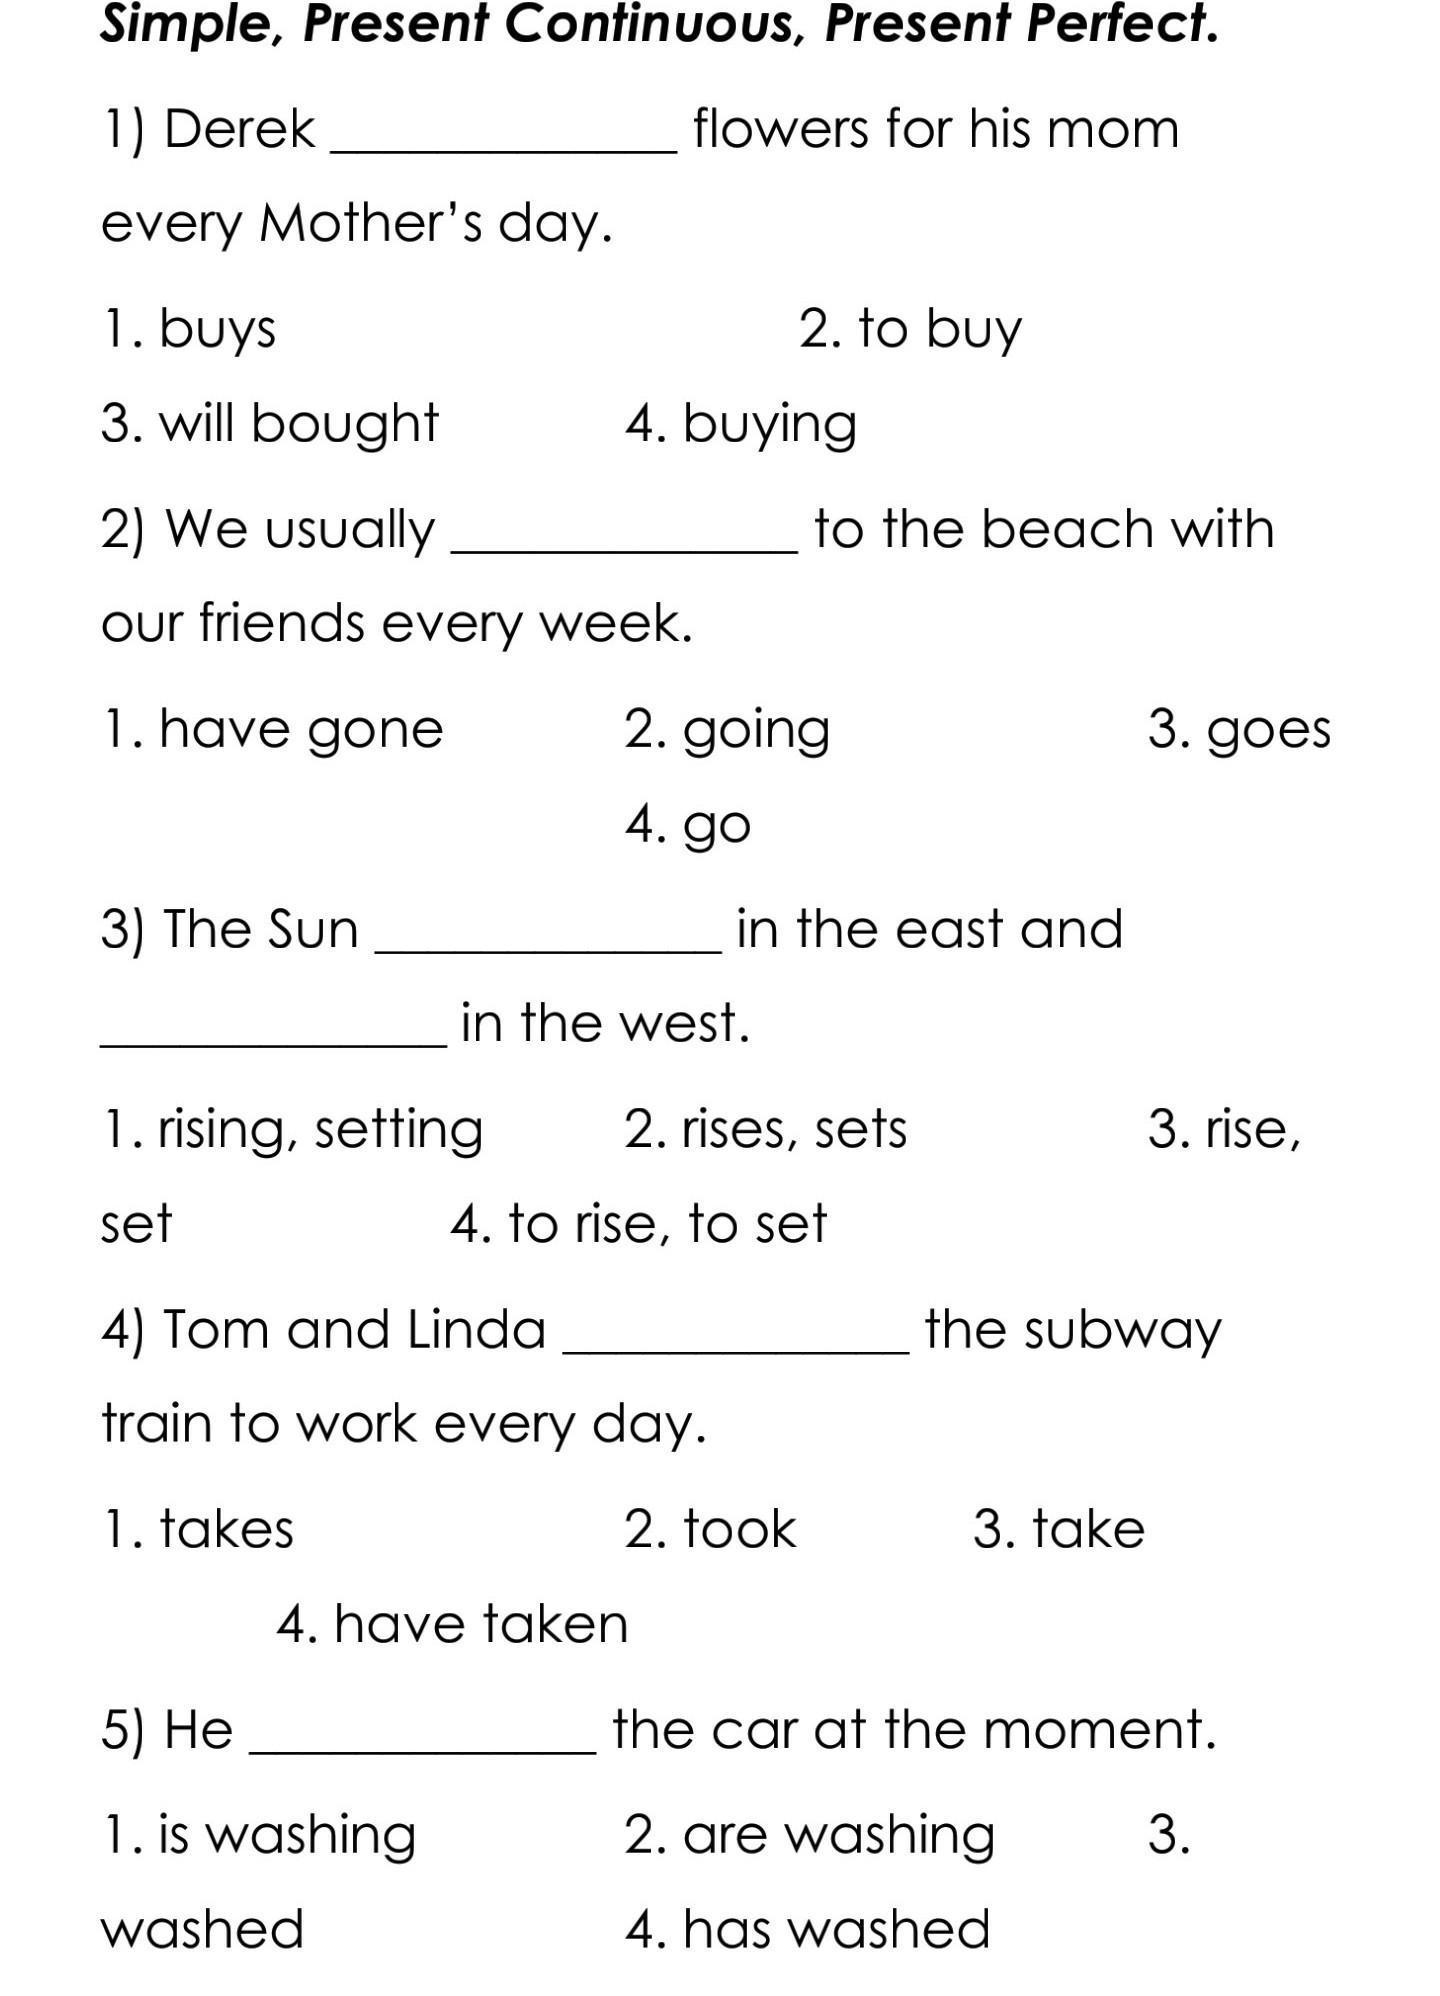 Inglés Present Simple Present Continuous Present Perfectayudaa Necesito Responder Estos Brainly Lat